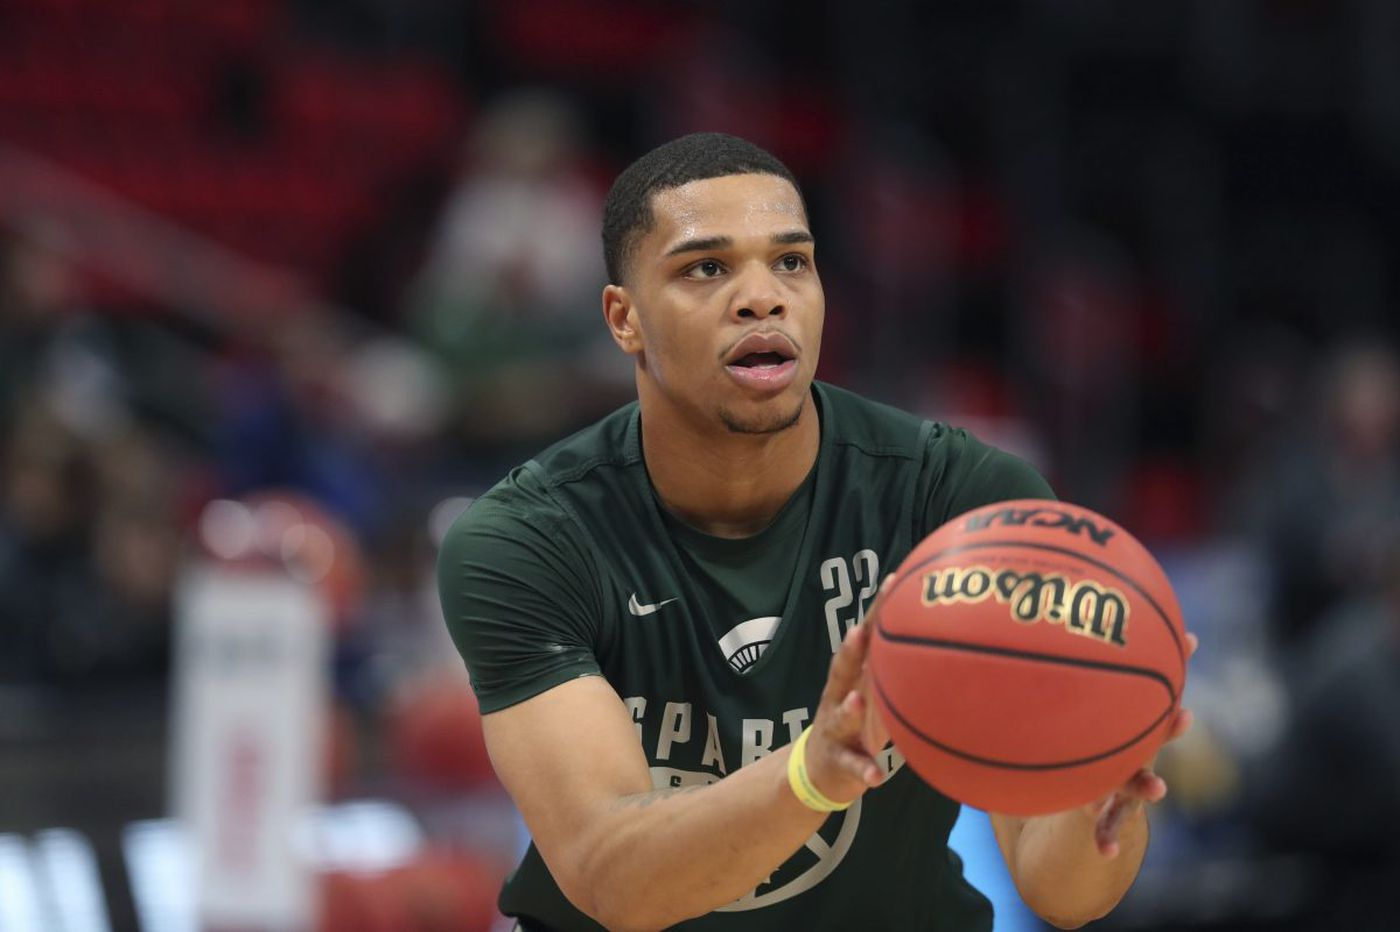 NBA draft prospect Miles Bridges sees Sixers as a good fit